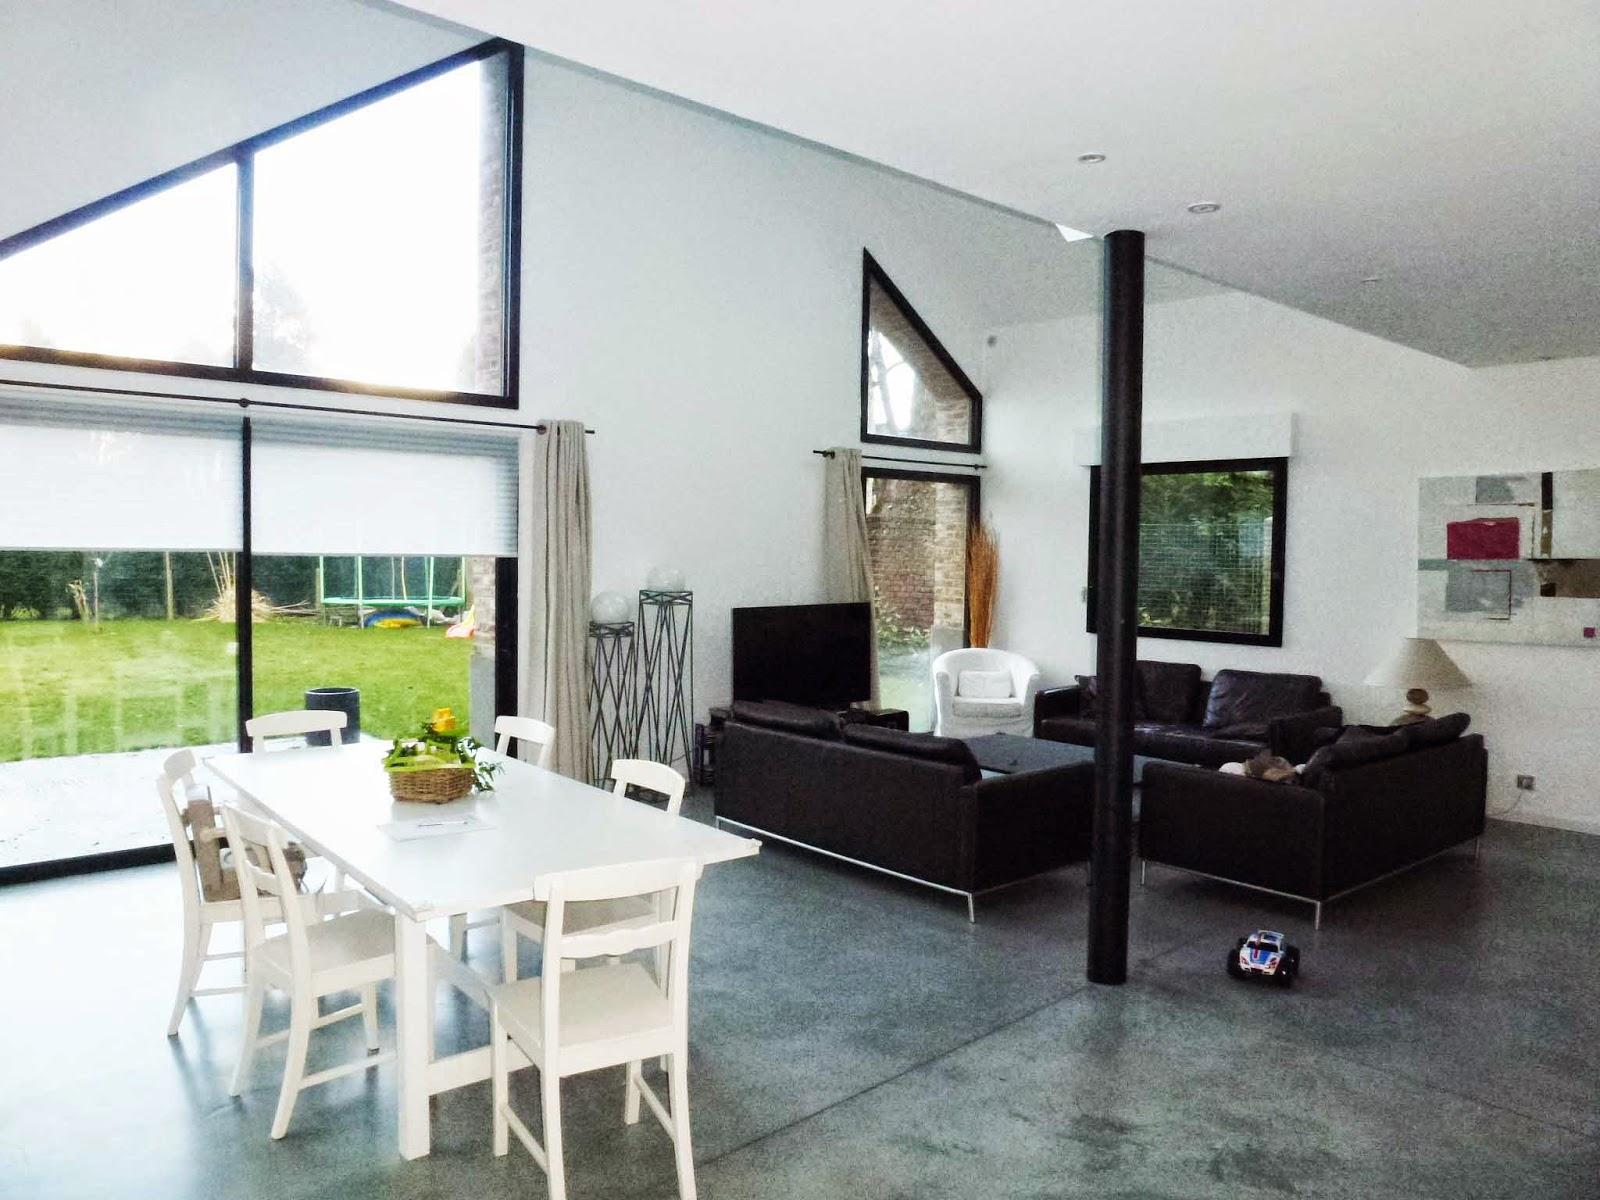 maison individuelle lambersart 59 agence delannoy simoens architectes dplg. Black Bedroom Furniture Sets. Home Design Ideas